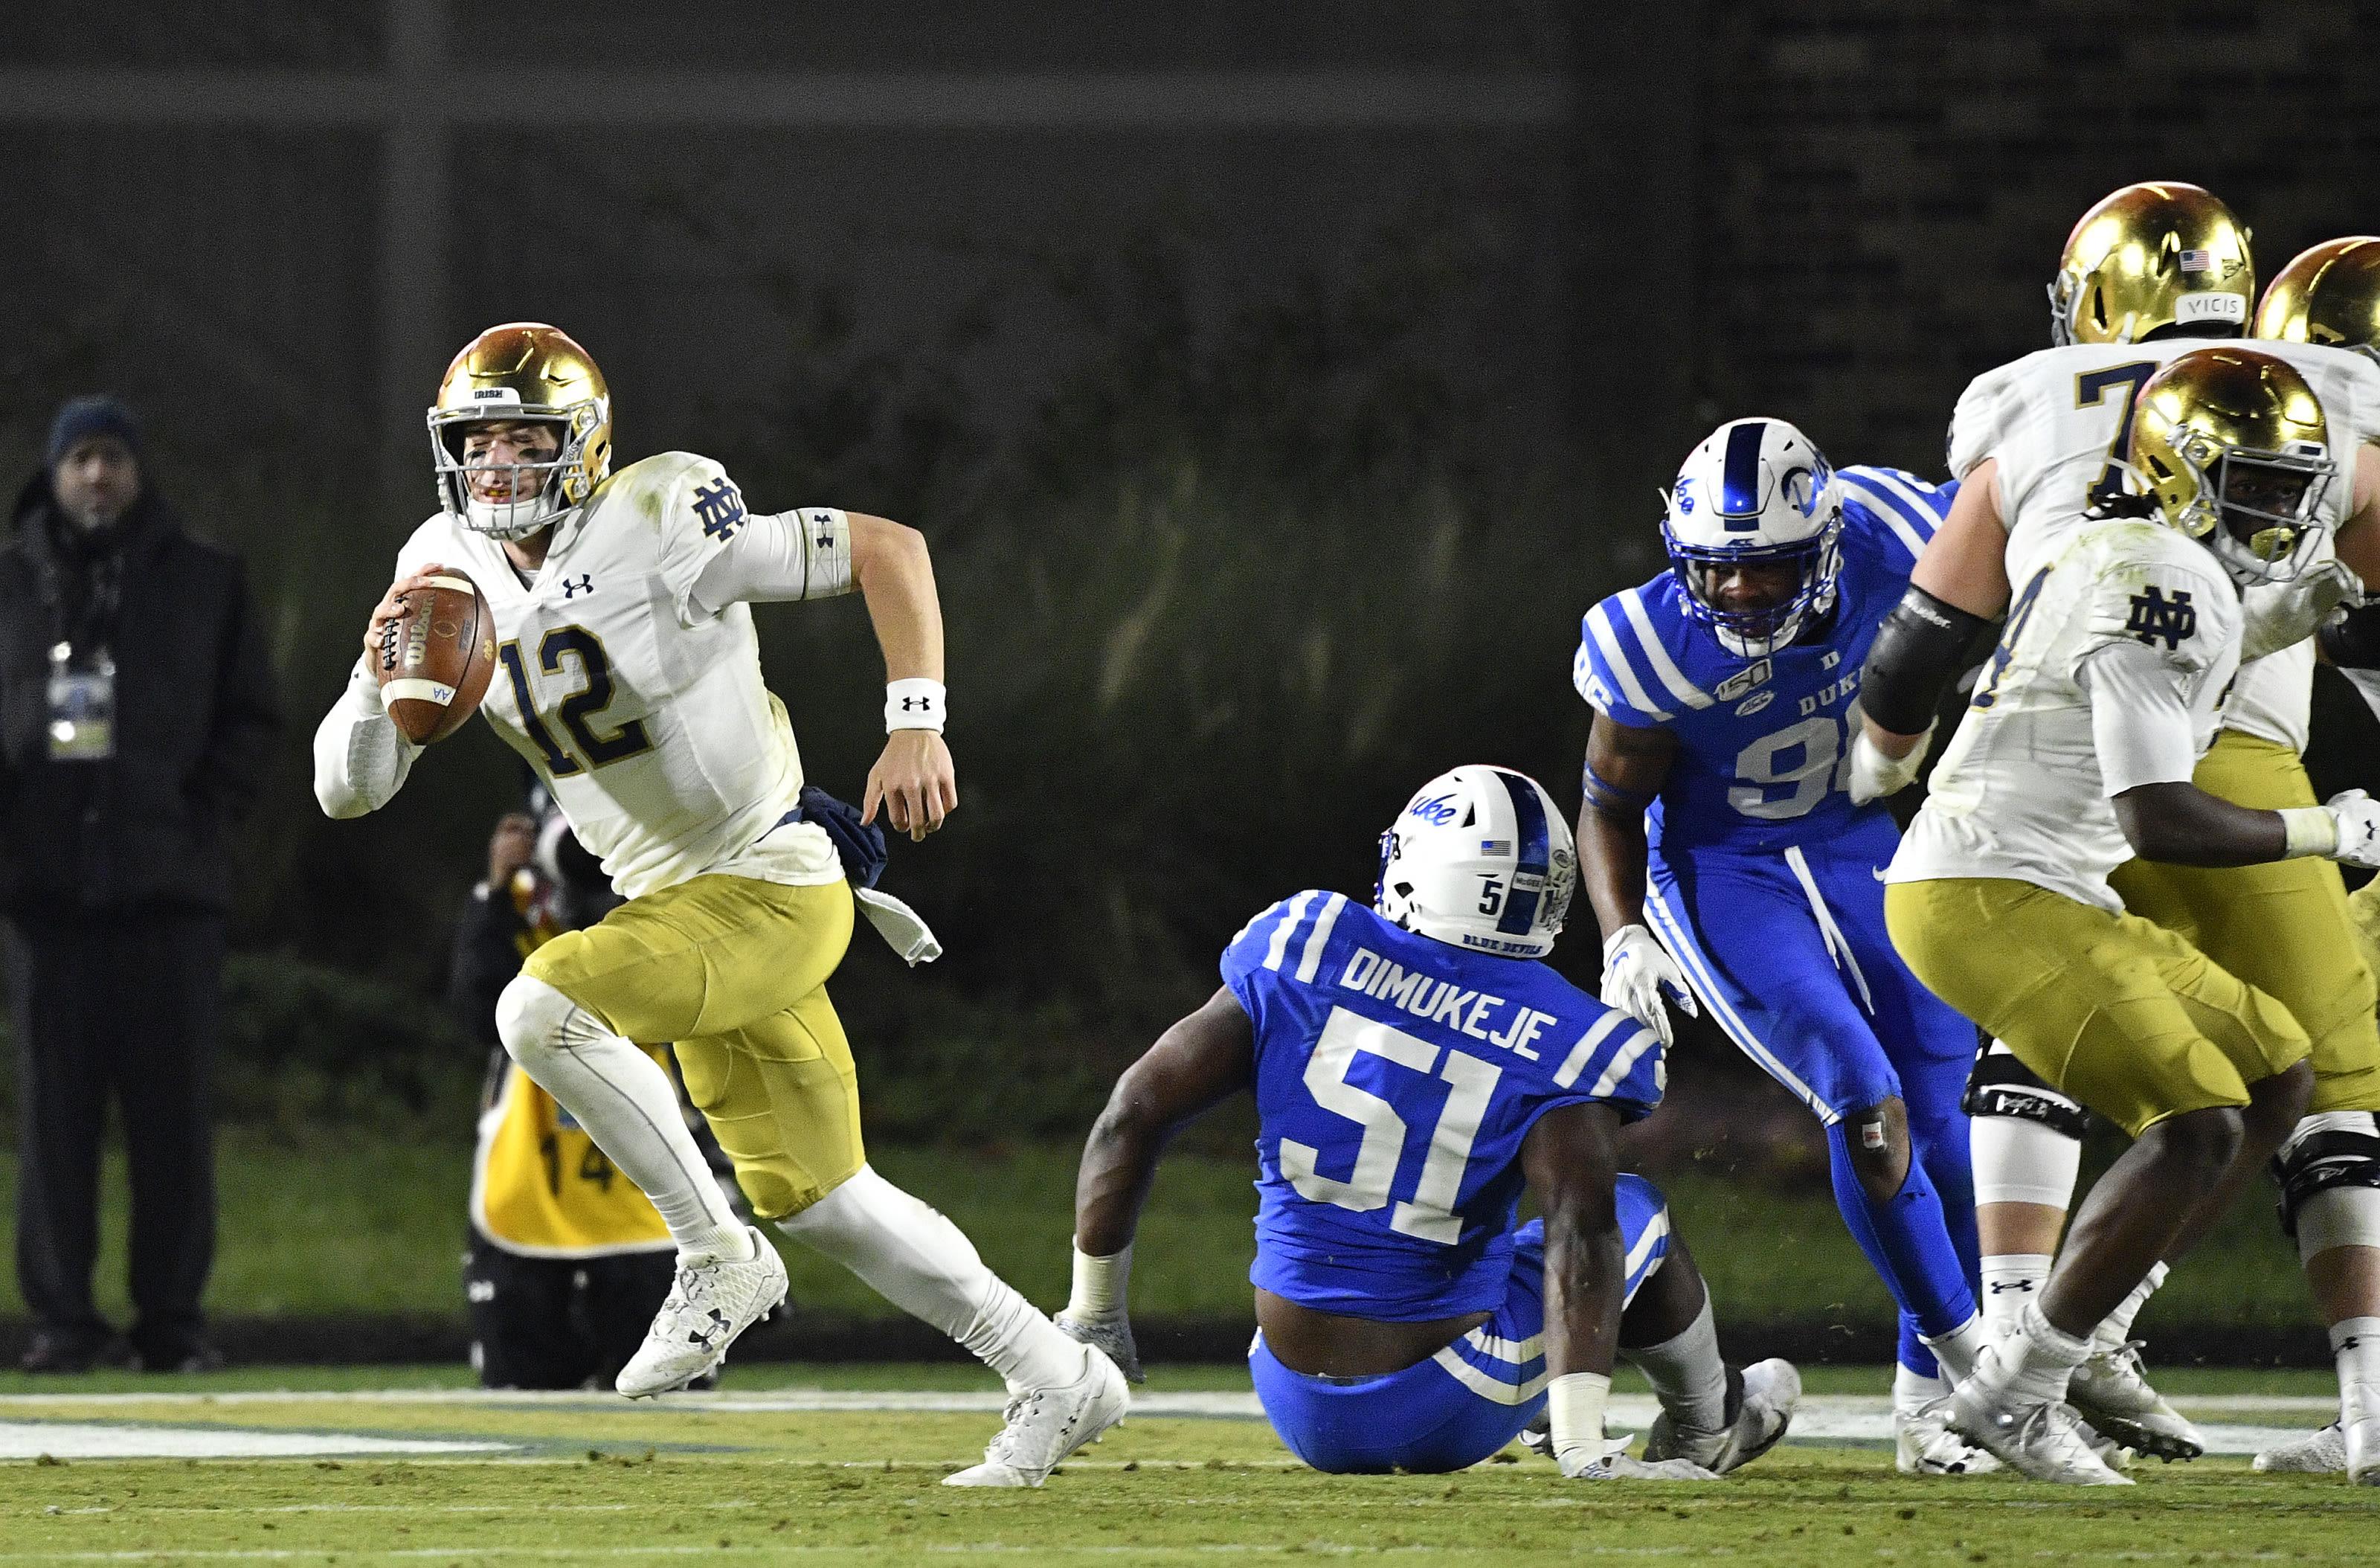 Duke vs. Notre Dame: 4 2021 NFL Draft prospects to watch